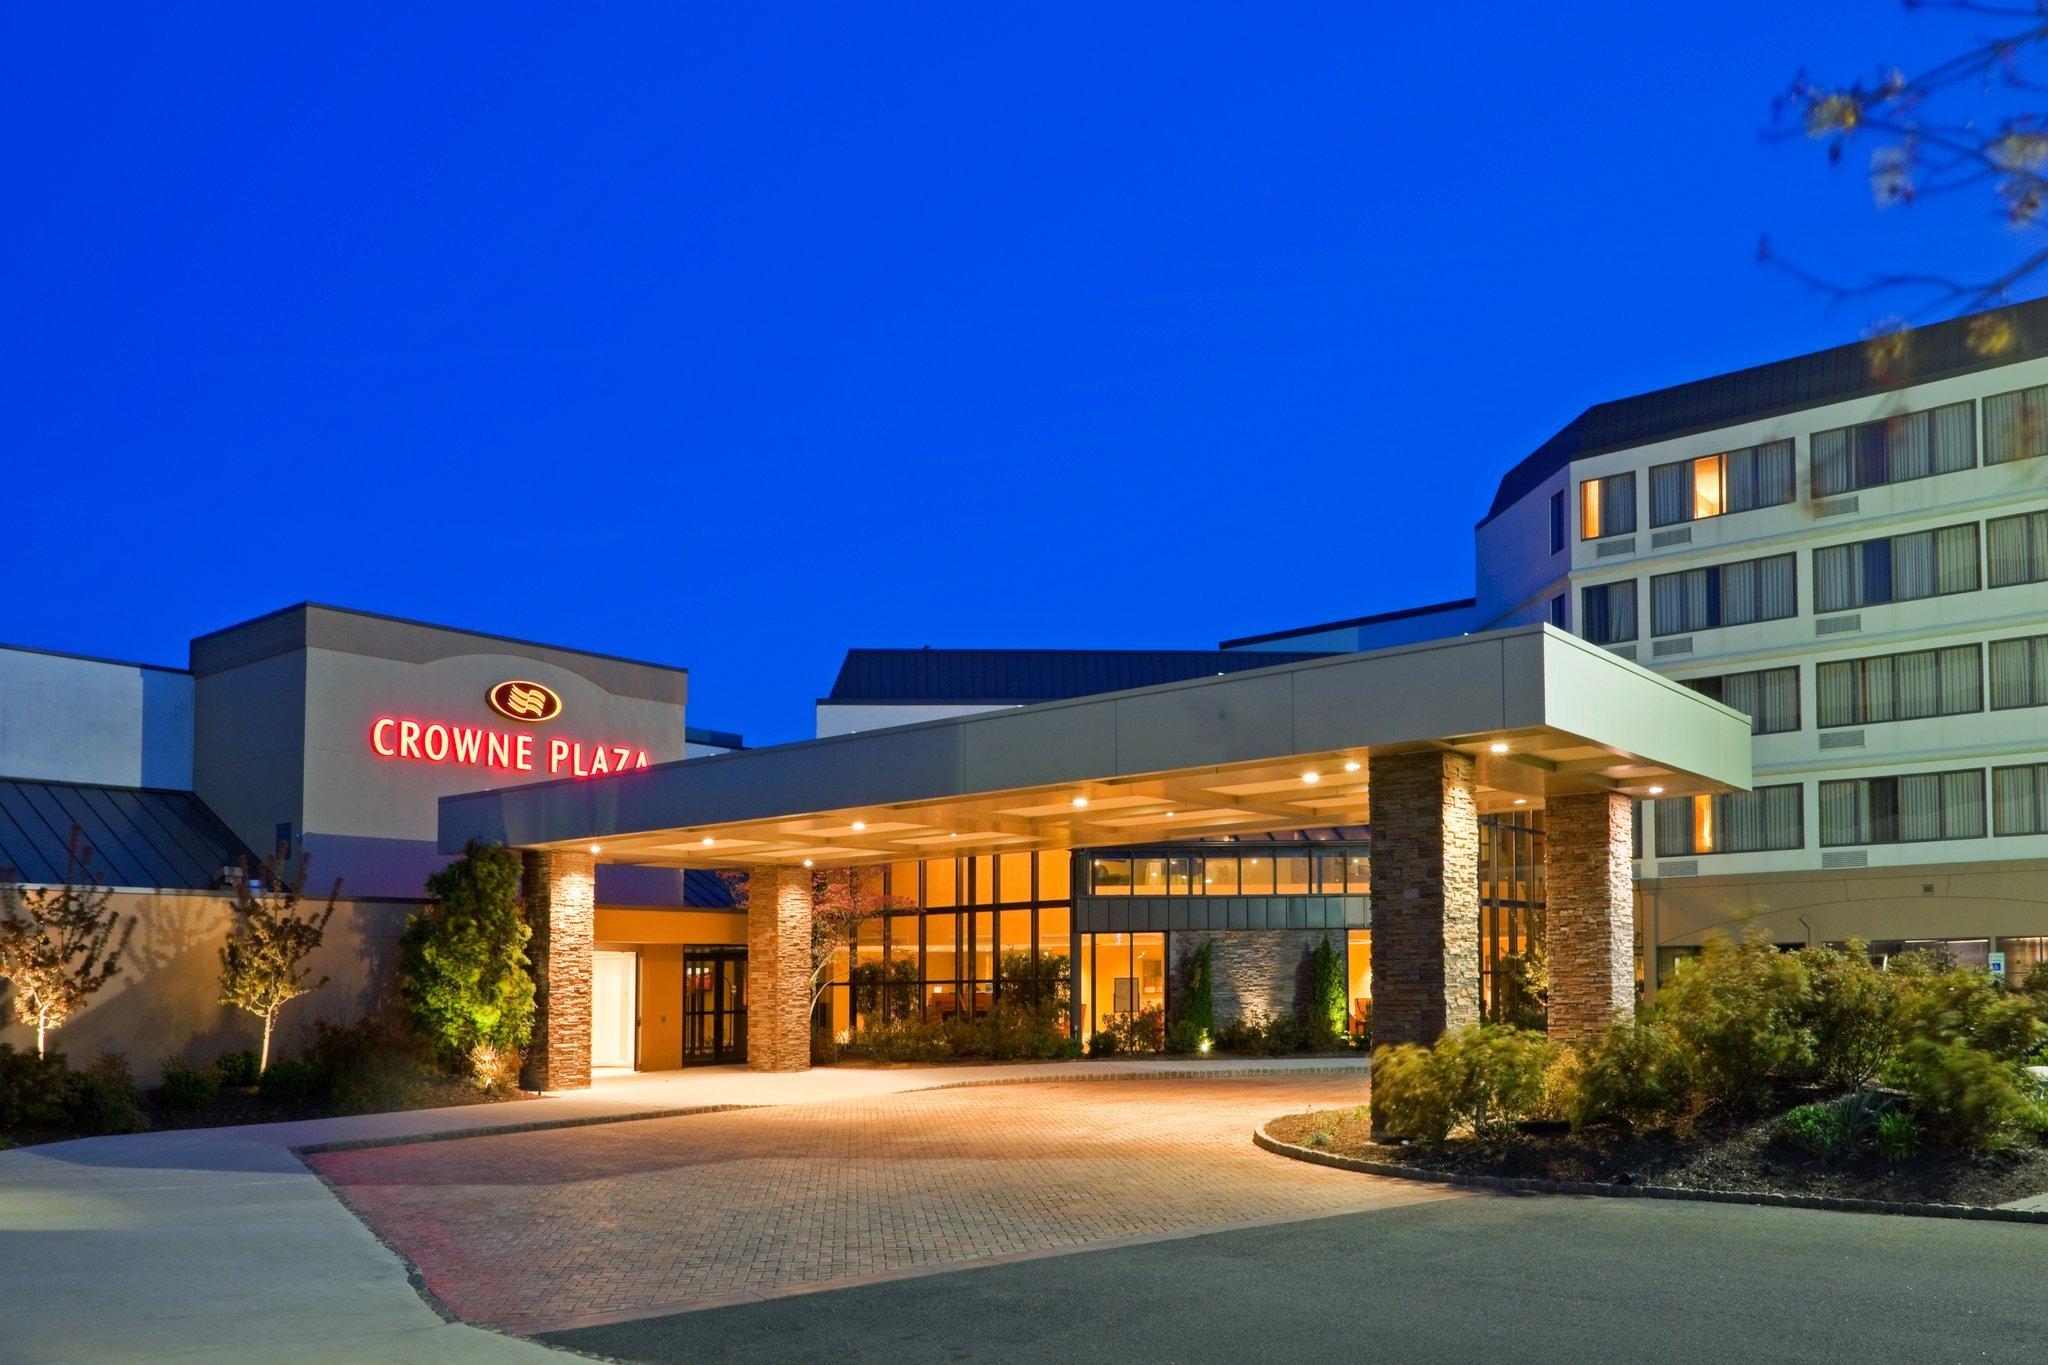 Crowne Plaza Hotel Fairfield